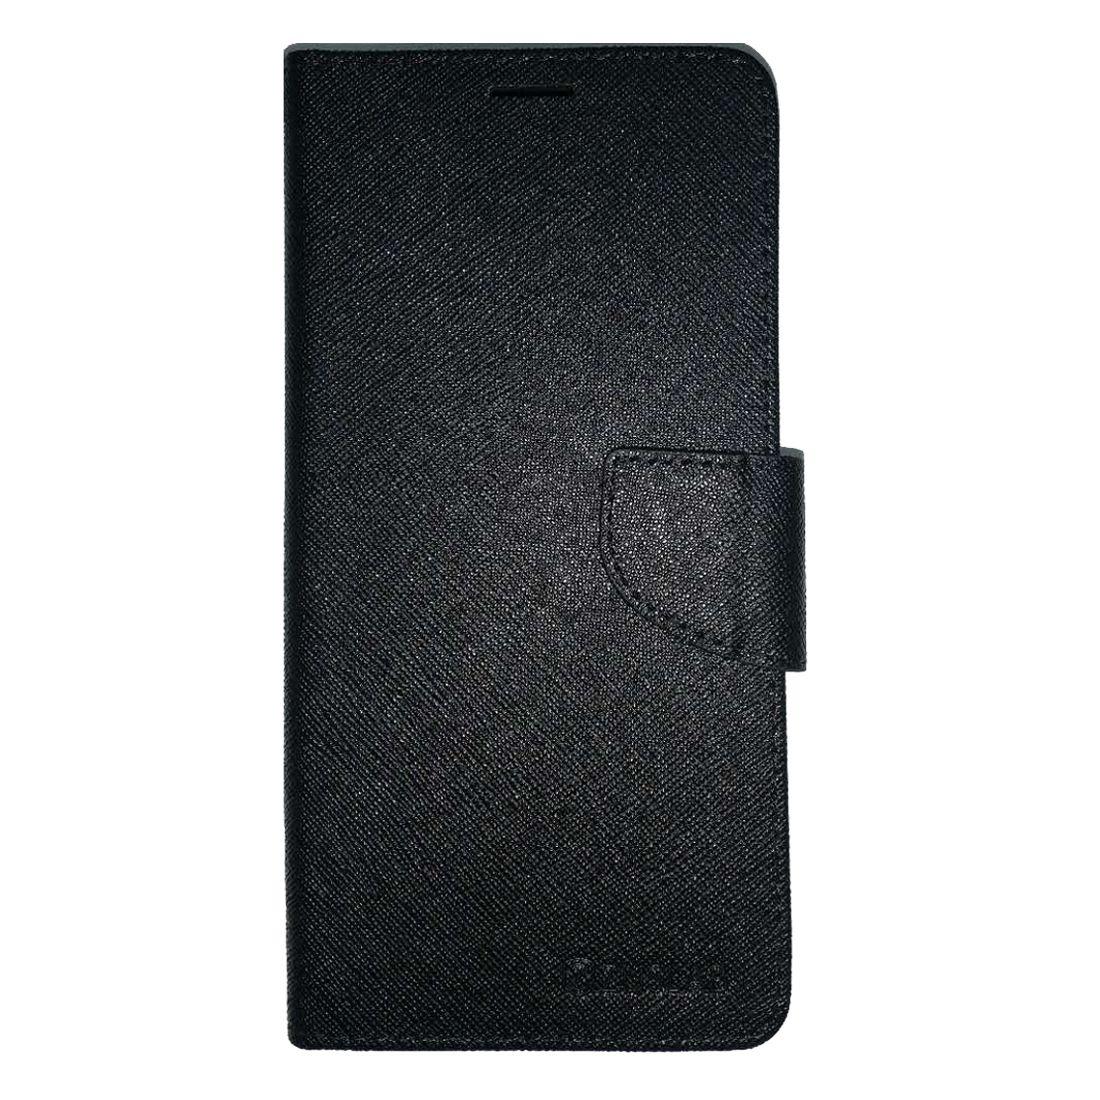 Zuslab Bonus Leather Case For Vivo S1 - Black